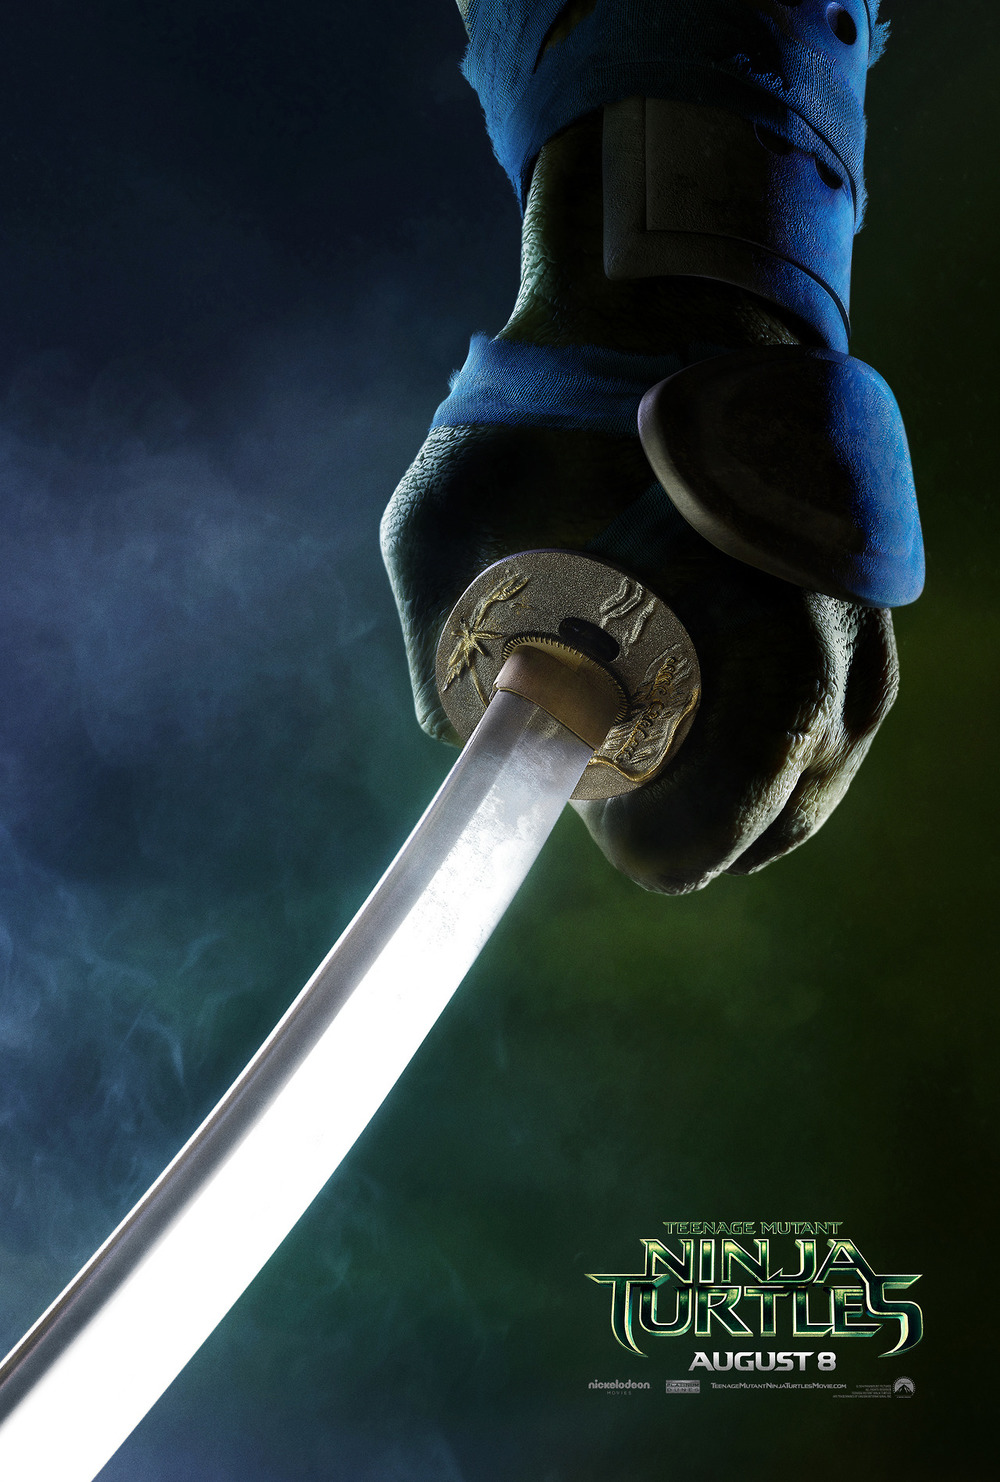 teenage-mutant-ninja-turtles-weapons-teaser-posters